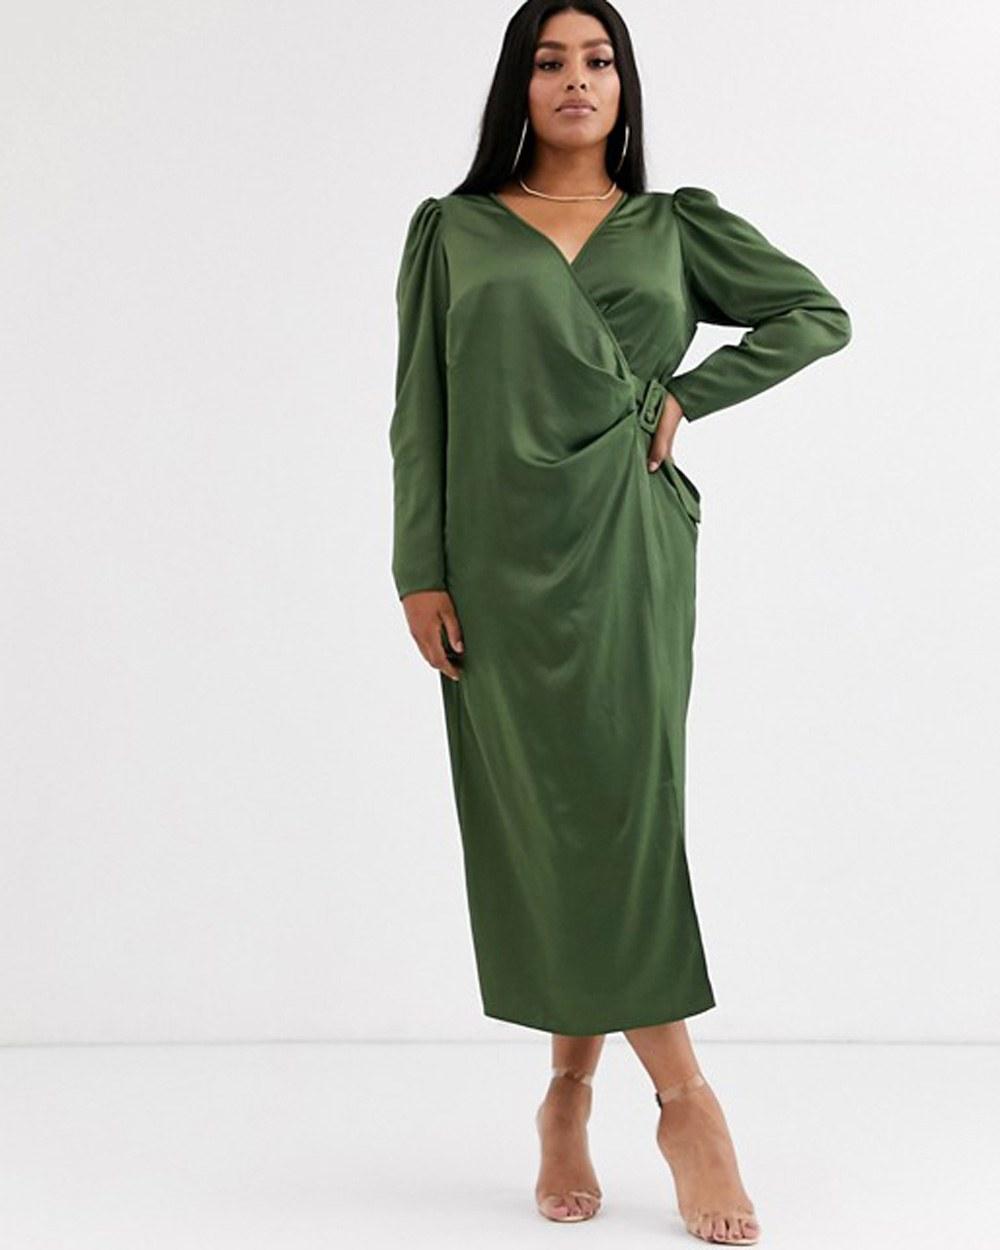 22+ Asos holiday maxi dresses trends